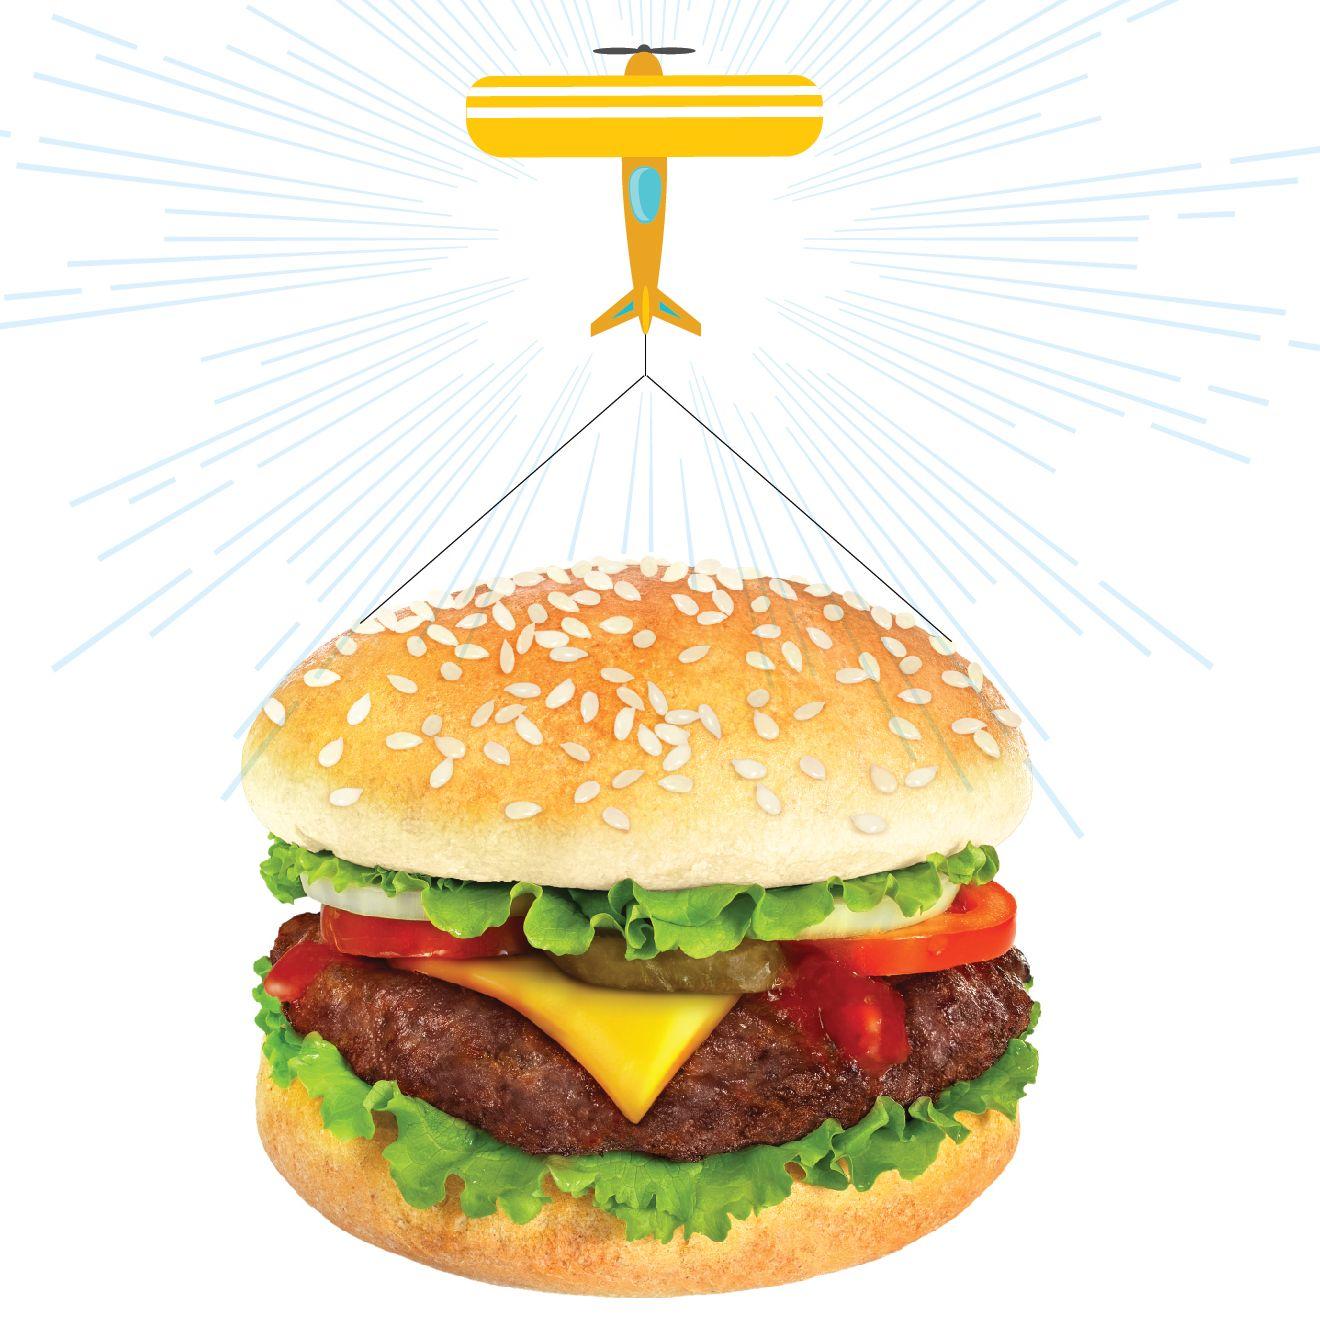 Burgerrun2 qxbeeu